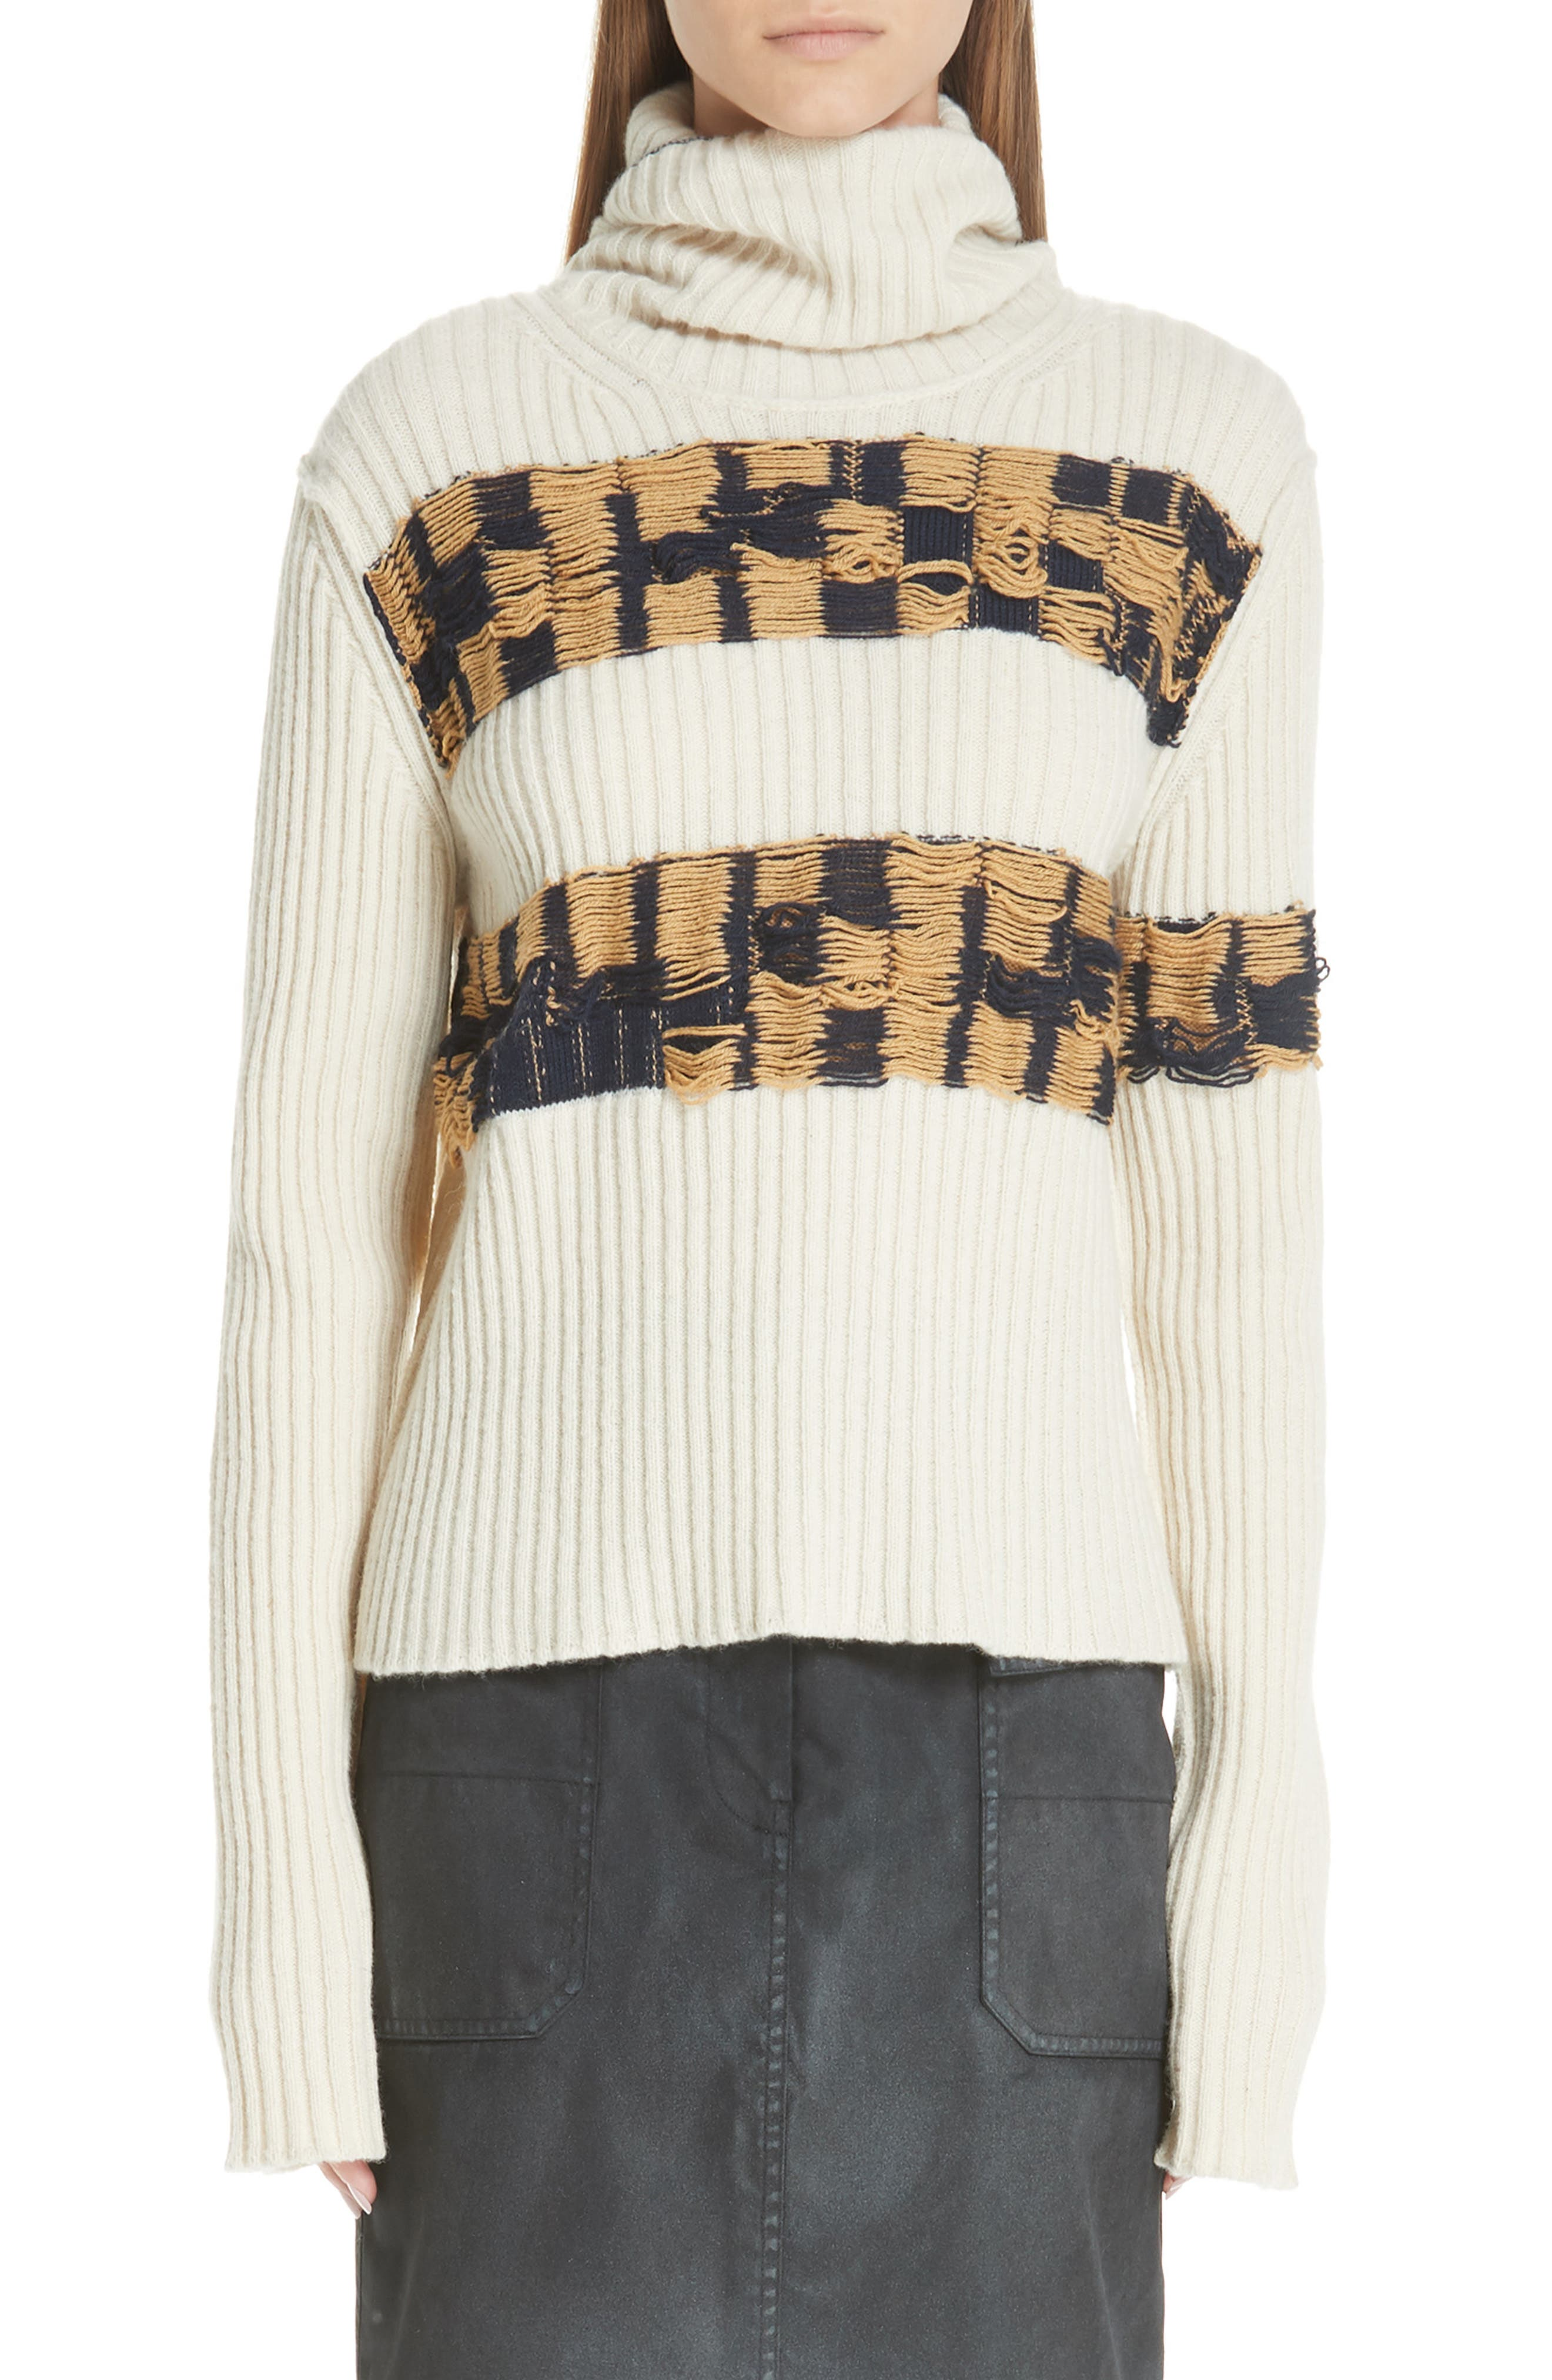 Quilt Jacquard Stripe Sweater,                         Main,                         color, ECRU HAY NAVY